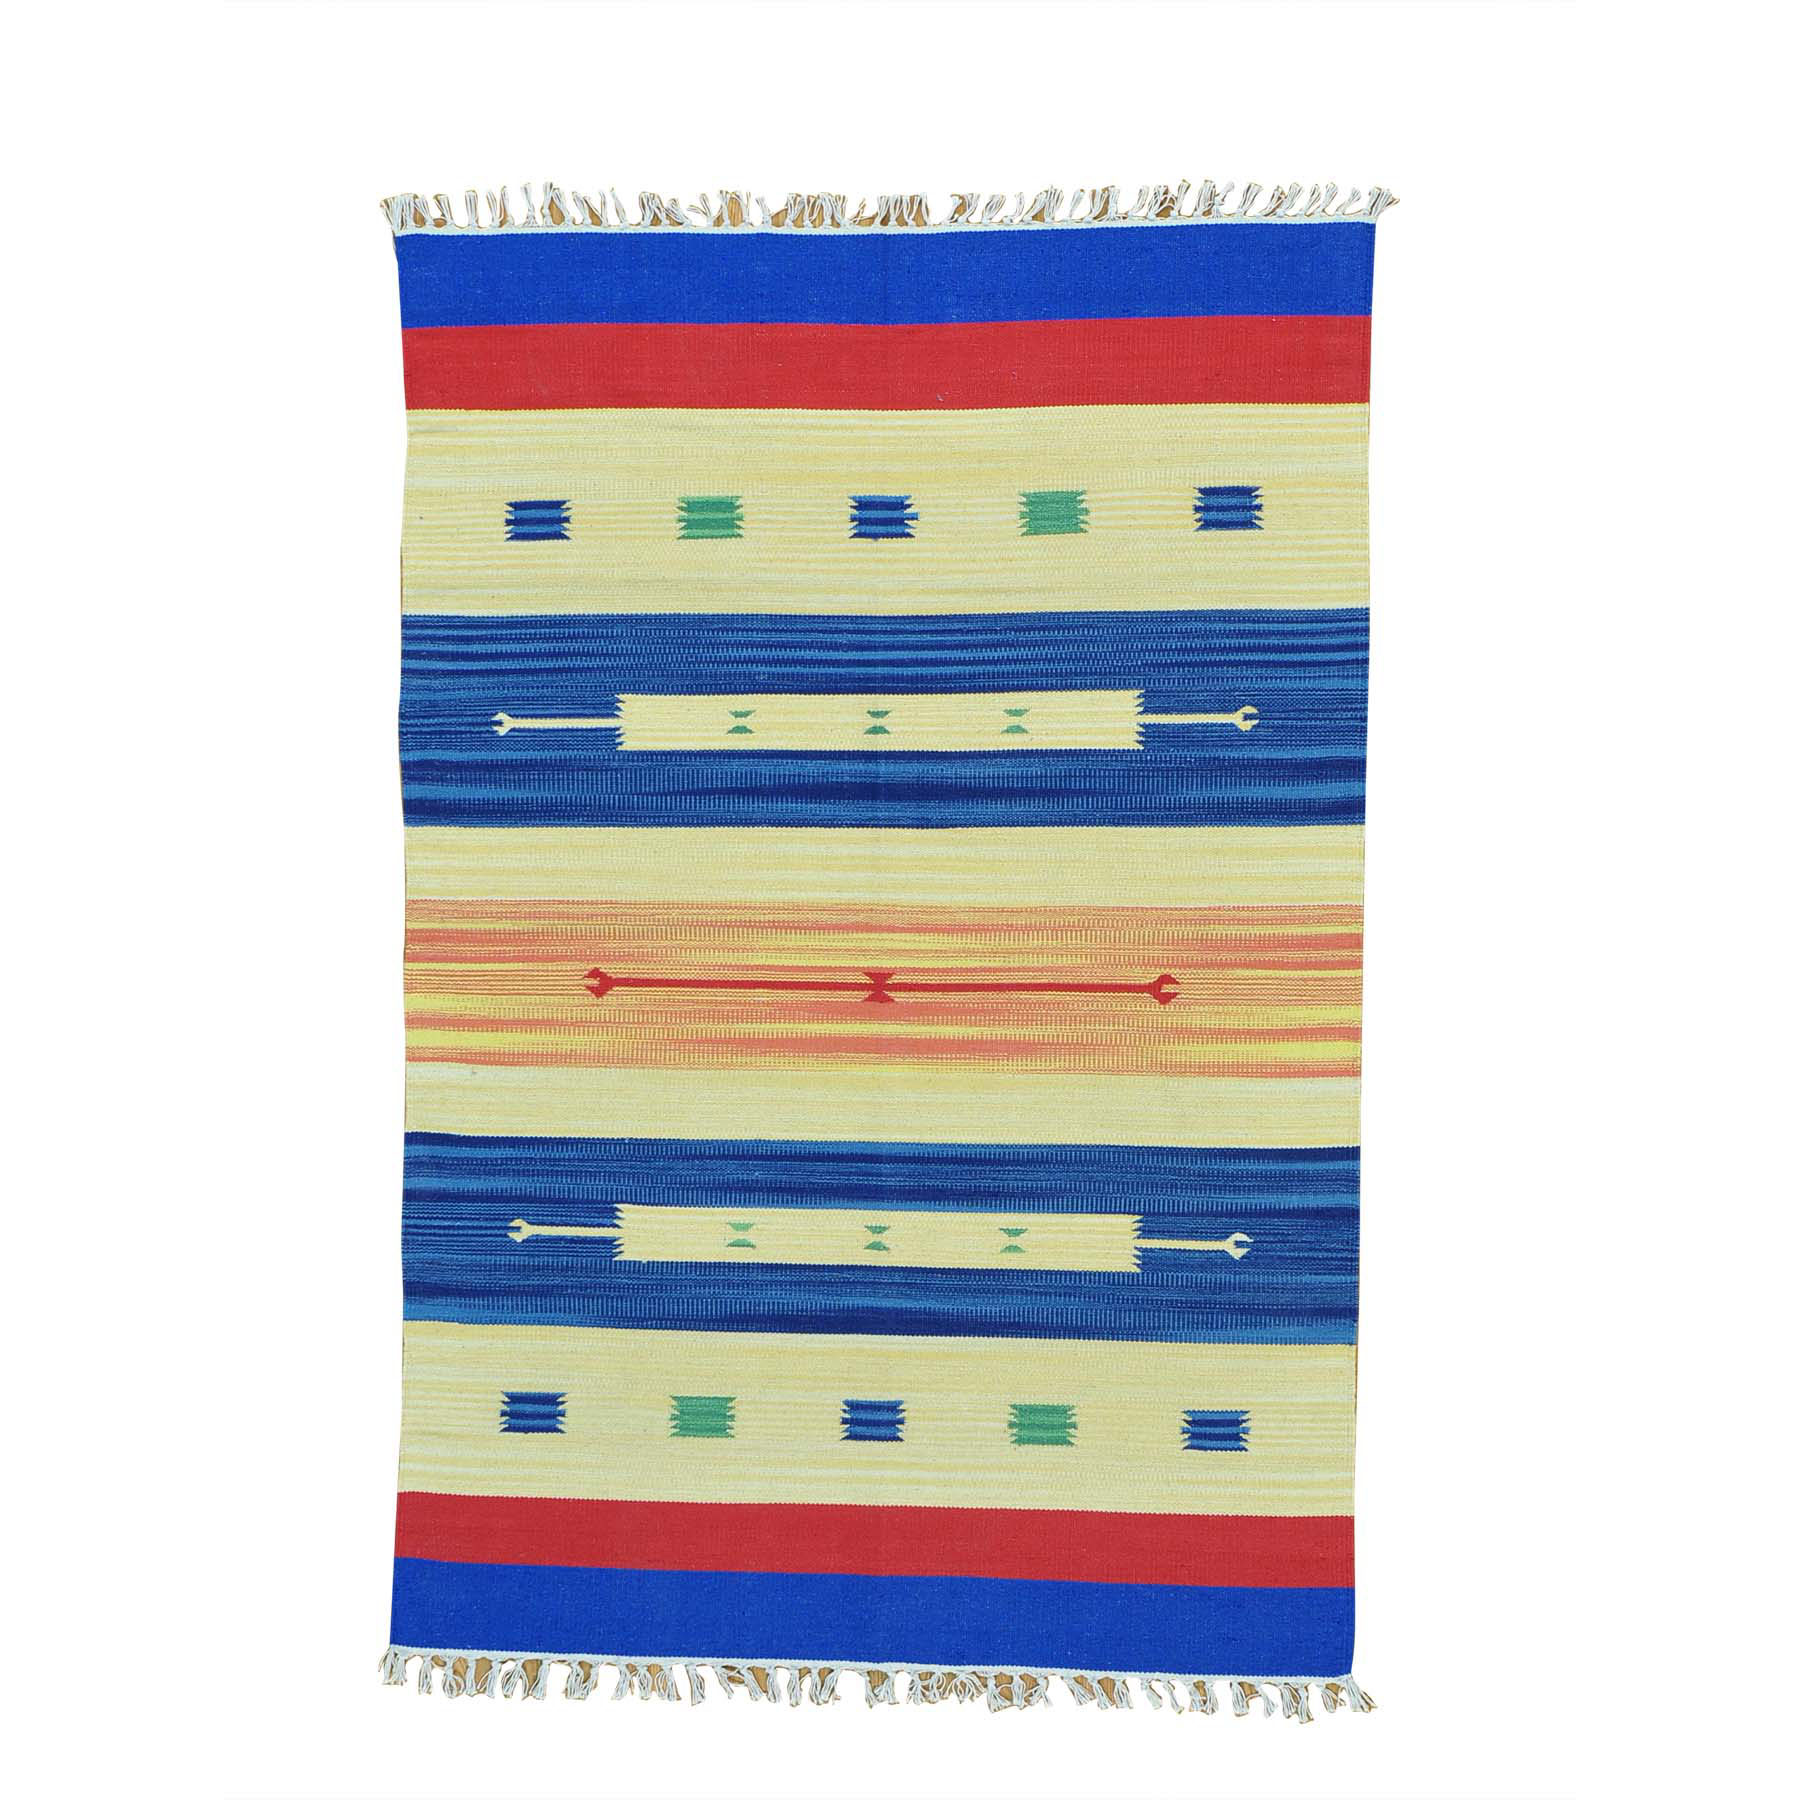 4'x6' Flat Weave Killim Hand Woven Navajo Design Rug